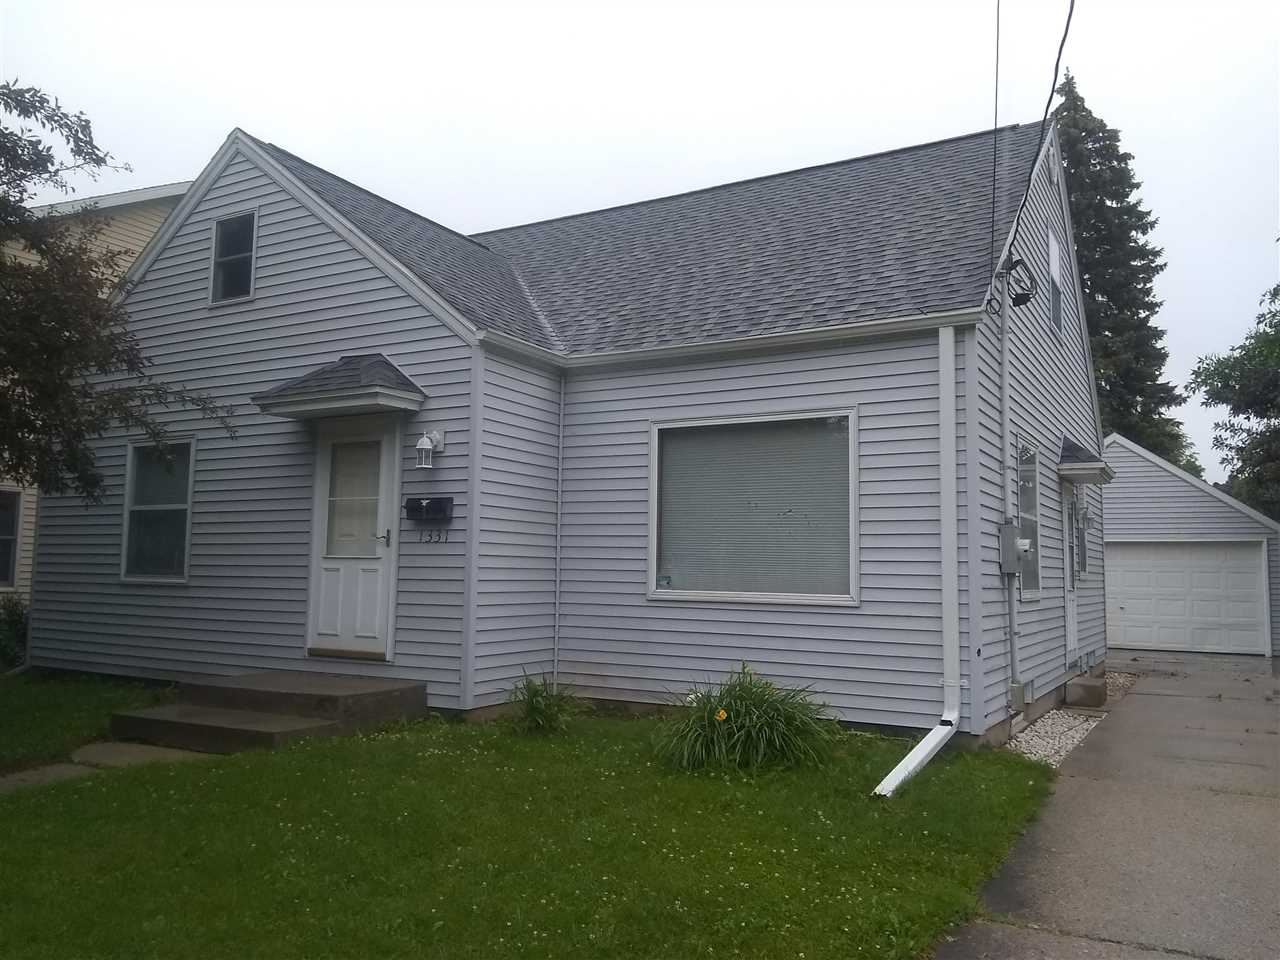 Photo for 1331 W SPRING Street, APPLETON, WI 54914 (MLS # 50243182)